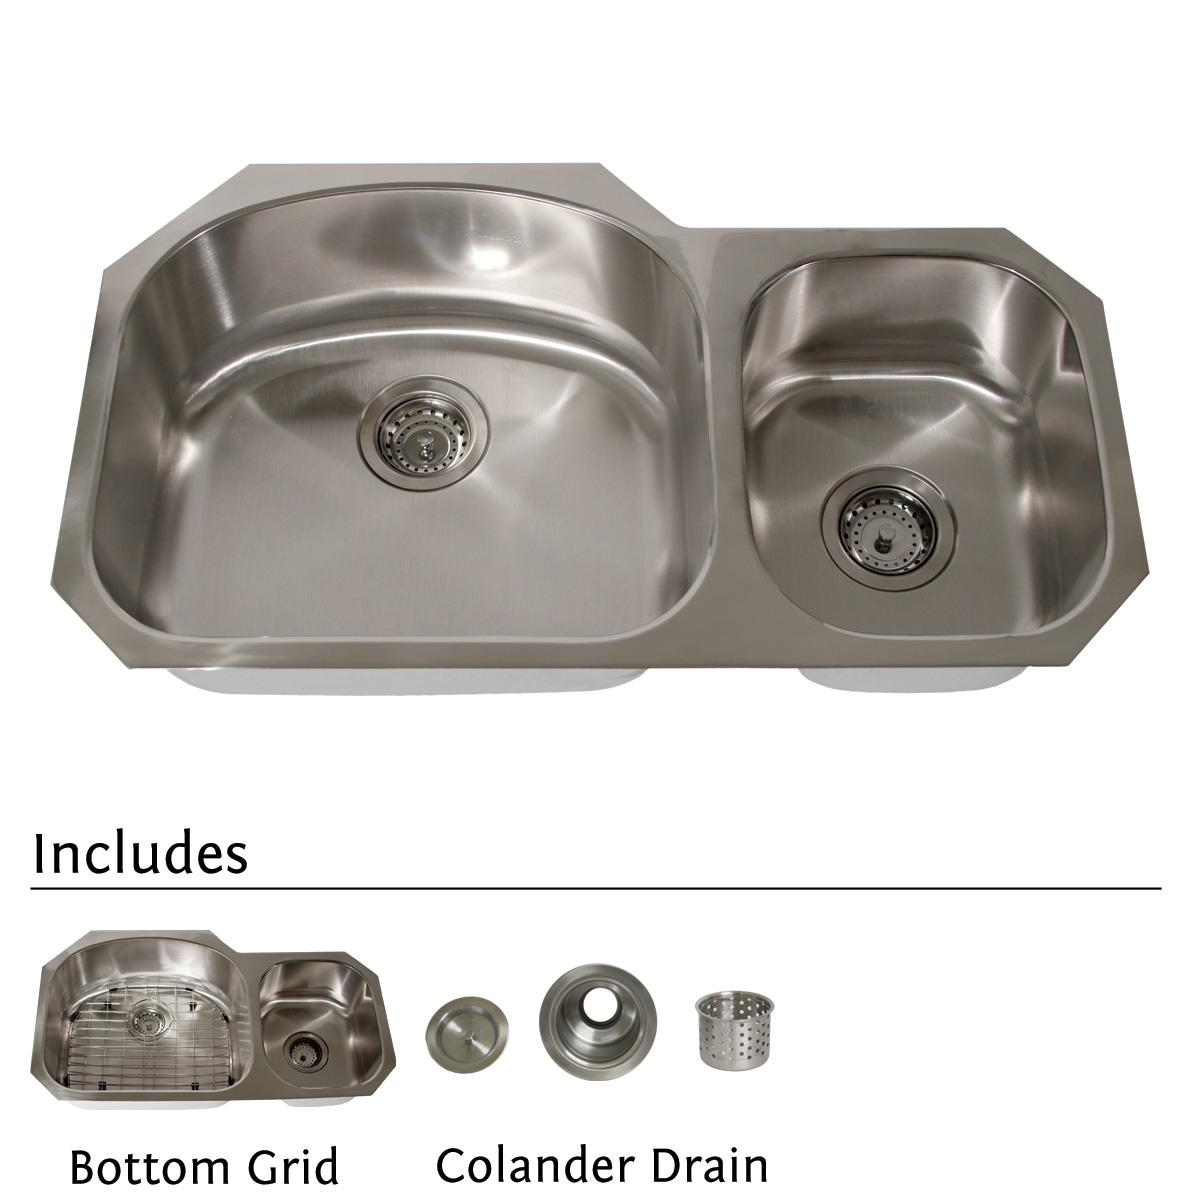 Highpoint Collection Stainless Steel 32-inch Undermount 70/30 2-bowl Kitchen Sink